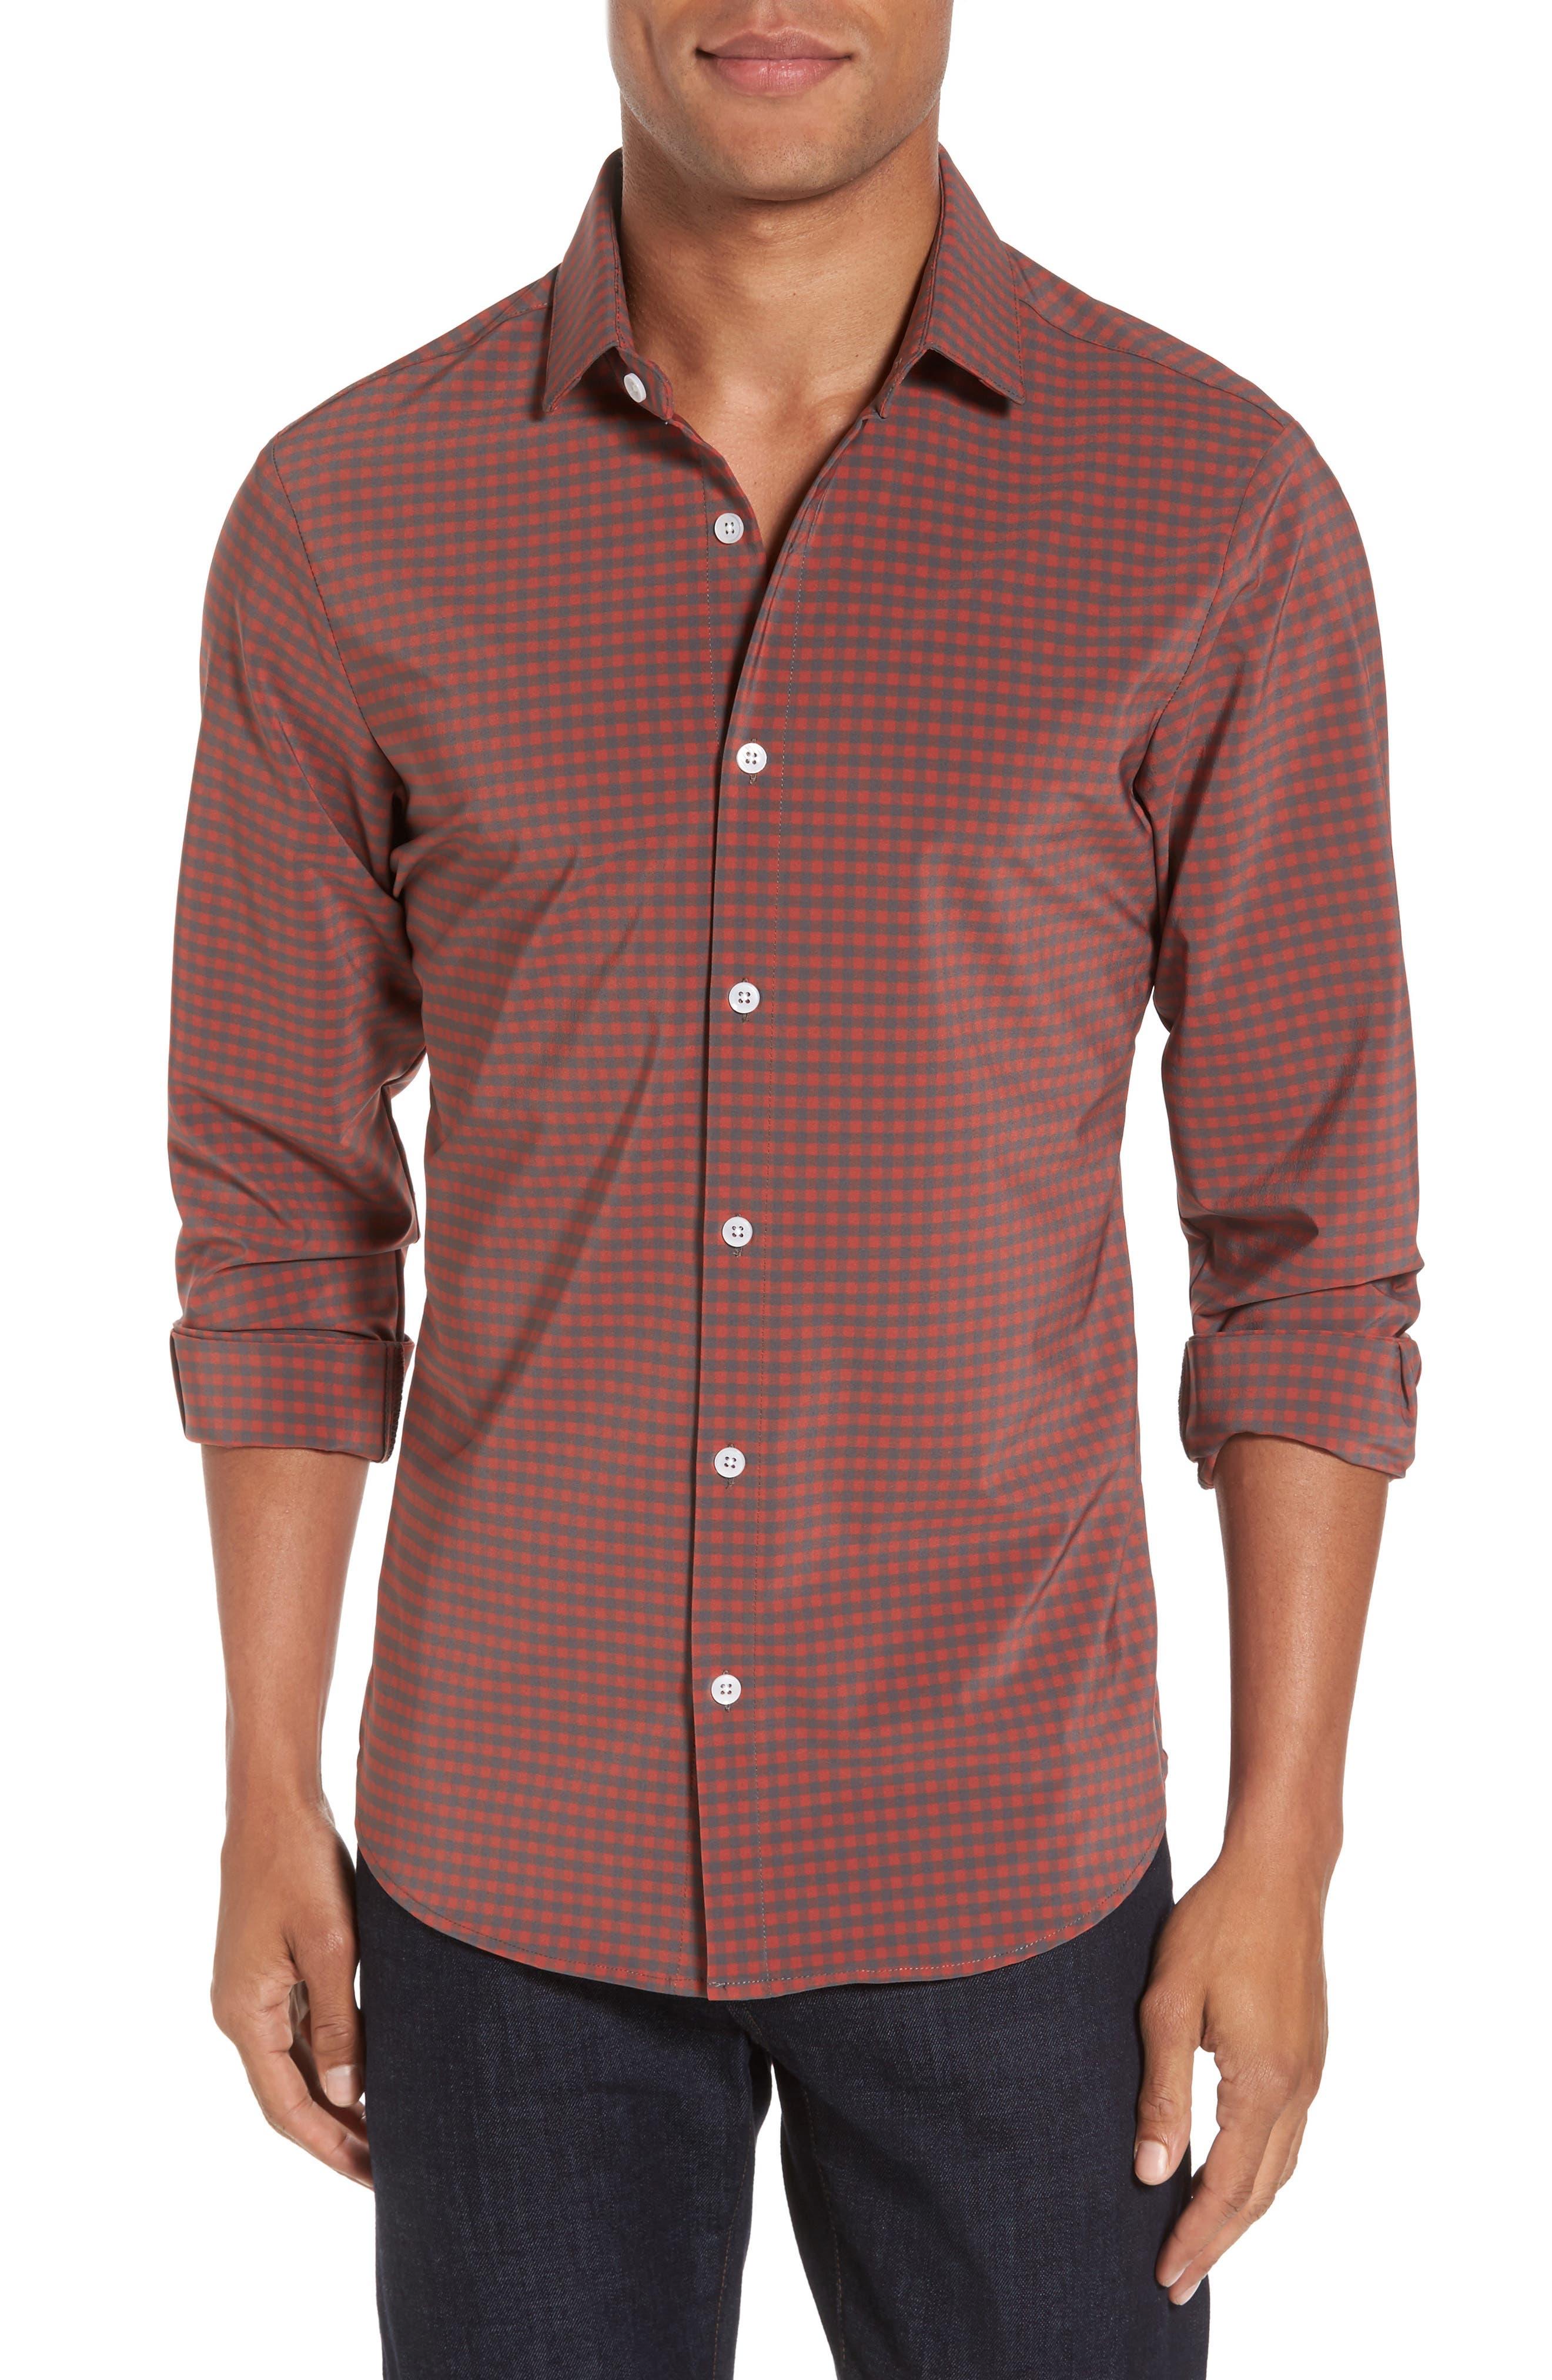 Douglas Grey & Chili Check Sport Shirt,                         Main,                         color, Red